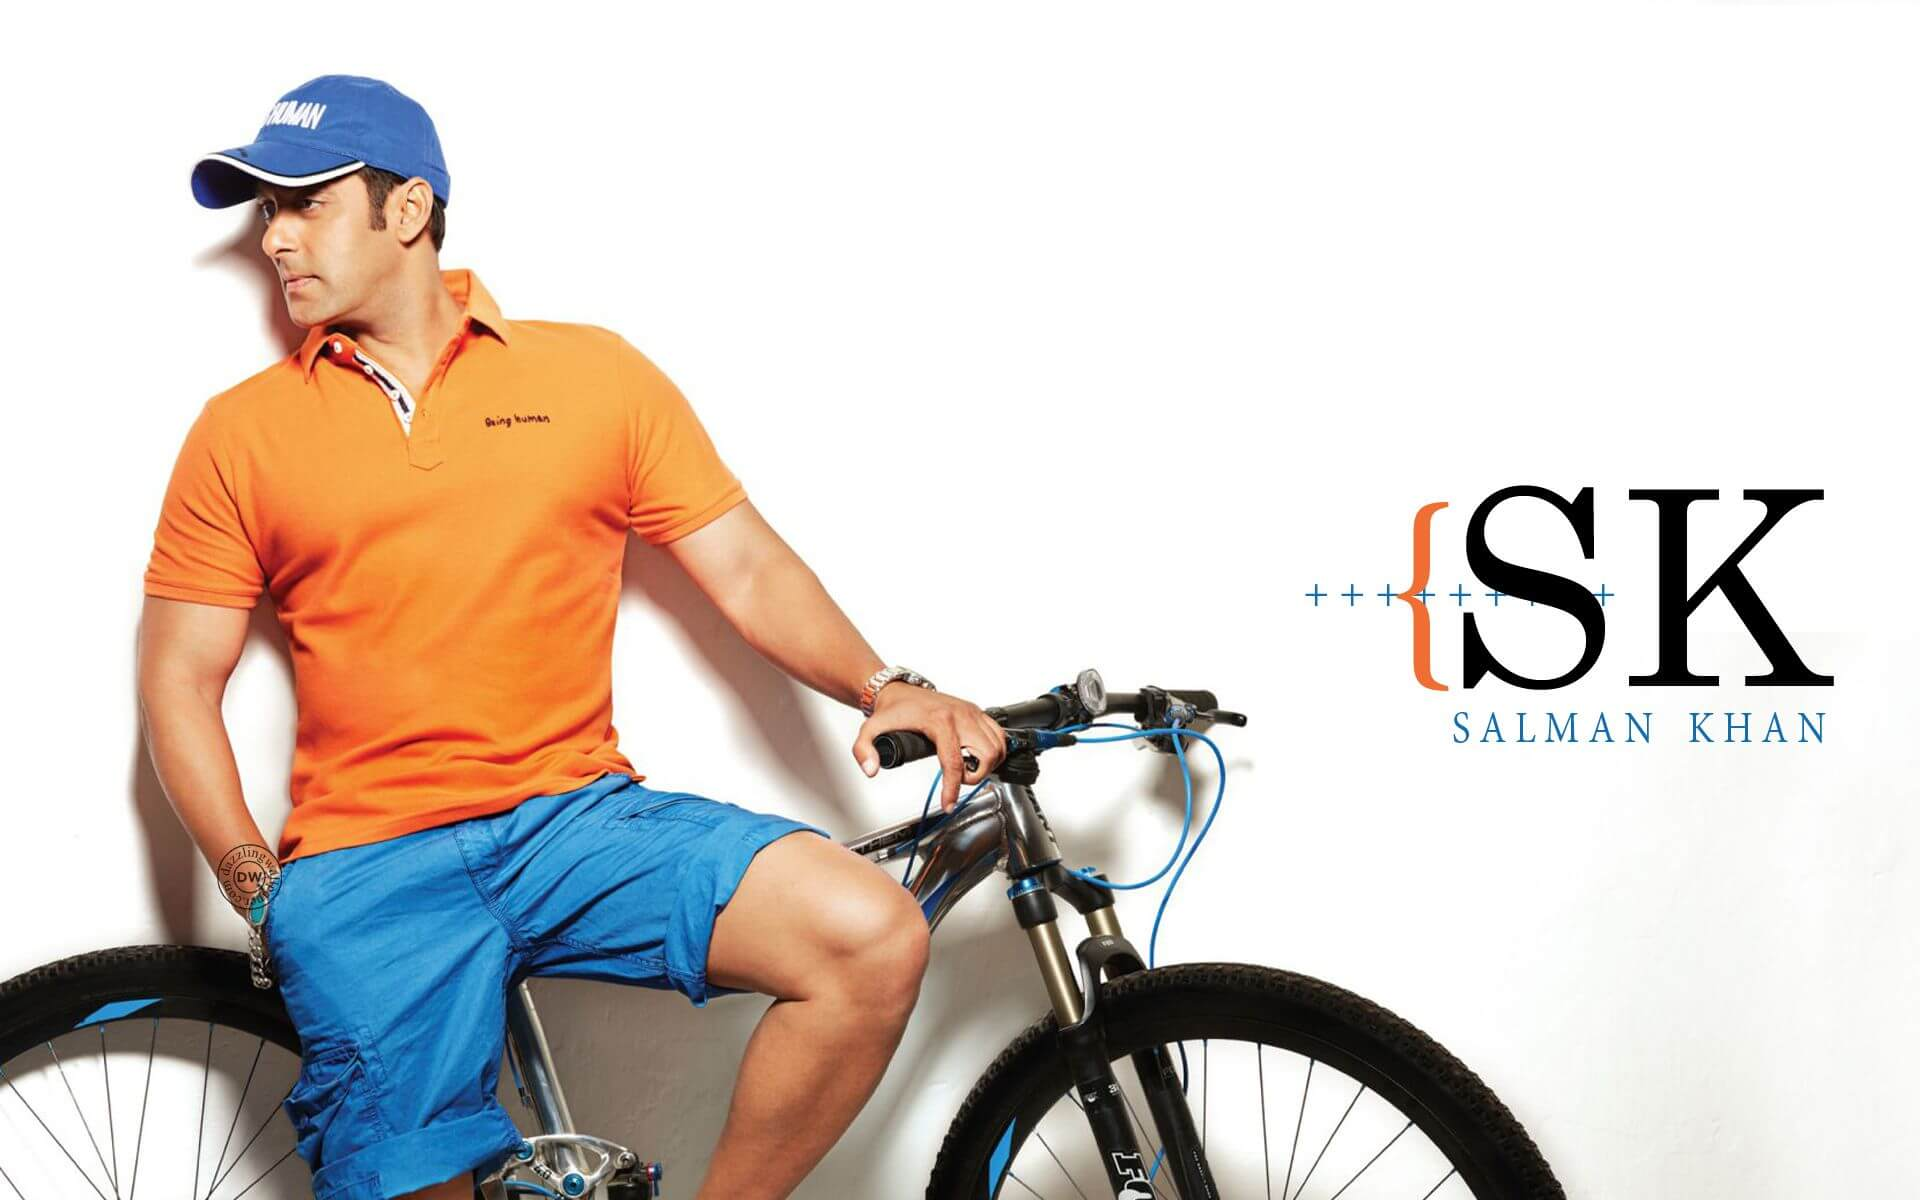 Salman Khan Photo, Age, News, Birthday, Height, Sister, Biography, Girlfriend, Awards, Address, Song, Video, Net Worth, Education, Twitter, Instagram, Facebook, Wiki, Imdb, Website, Youtube (53)